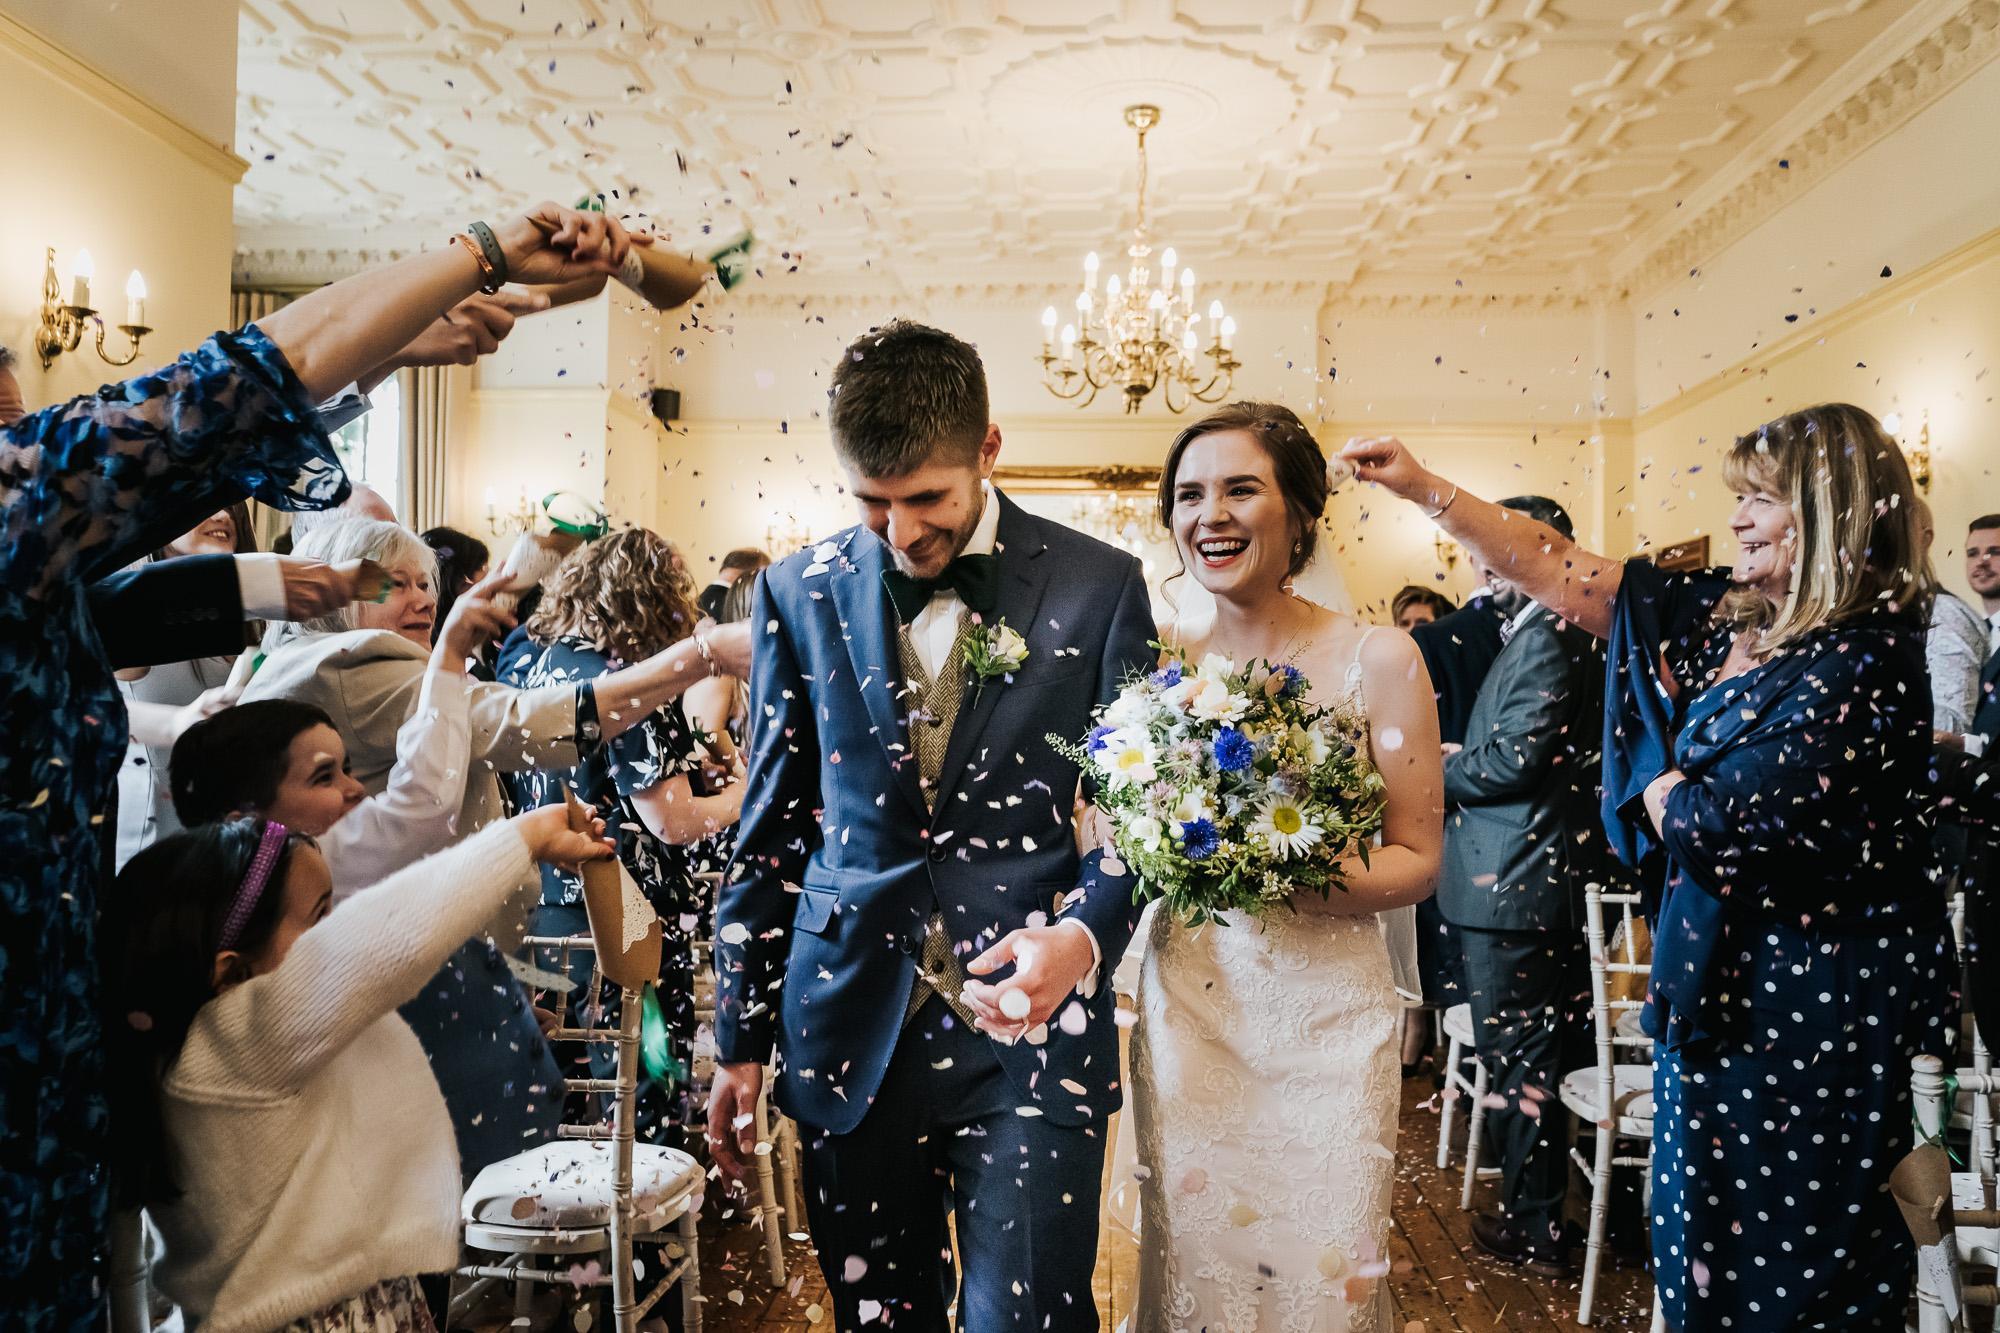 Nunsmere Hall Hotel Wedding photograhpy in cheshire wedding photographer (21 of 42).jpg